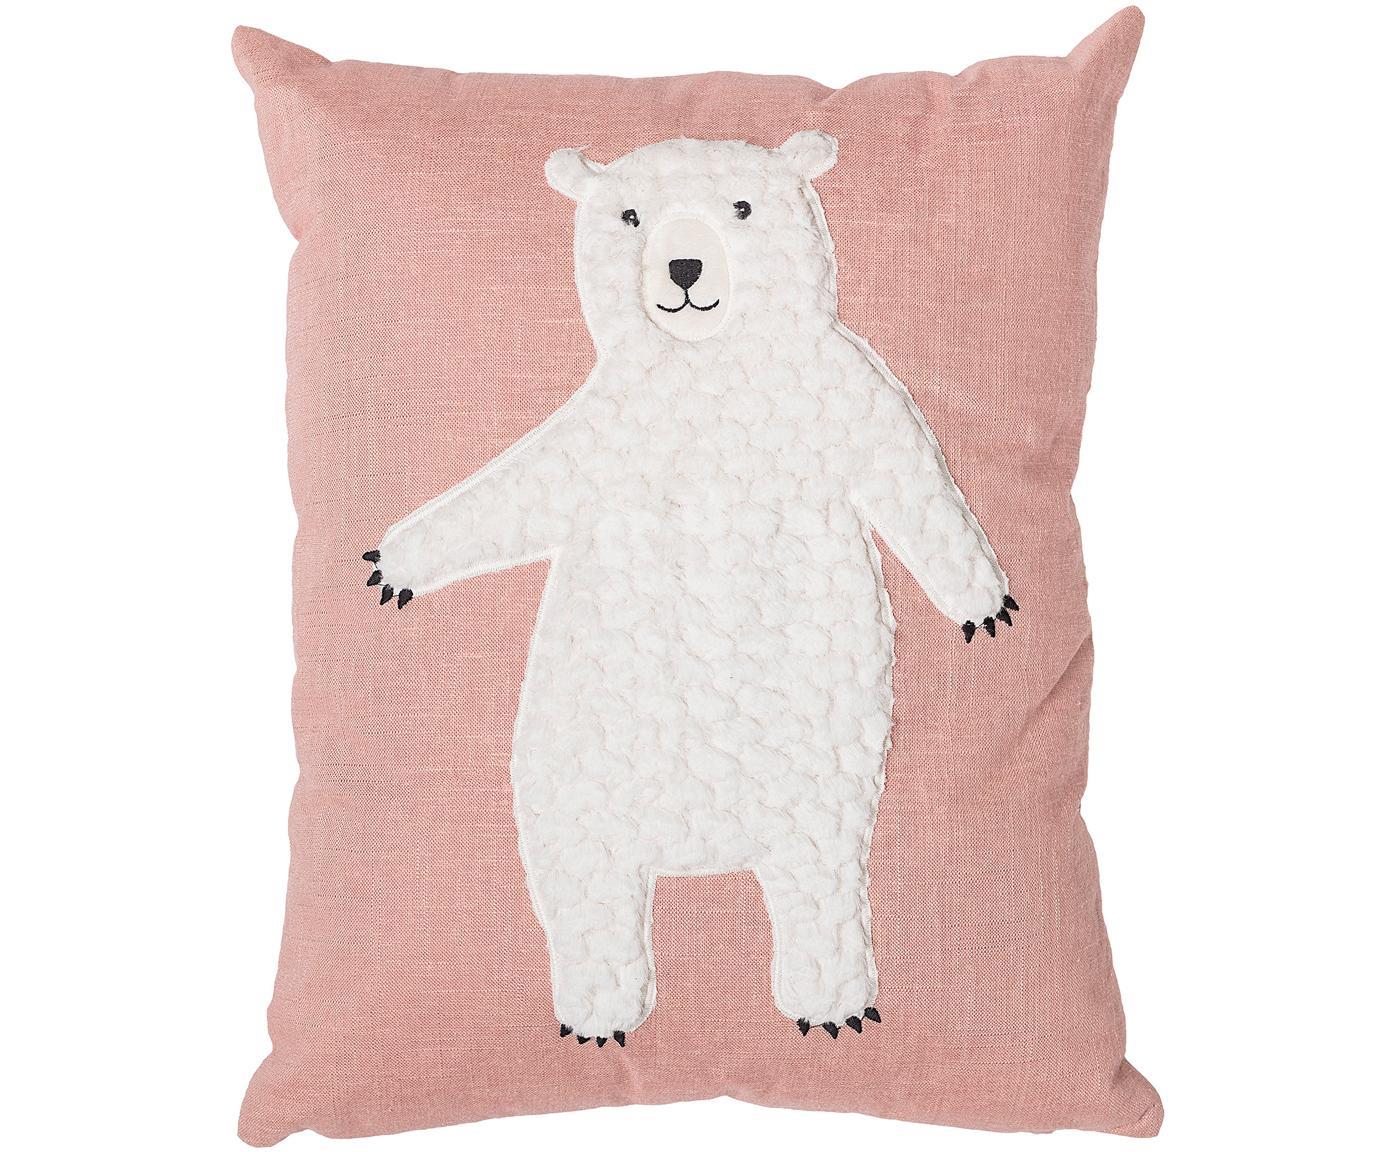 Cojín Bear, con relleno, Tapizado: 70%algodón, 30%poliéste, Rosa, blanco, An 40 x L 50 cm